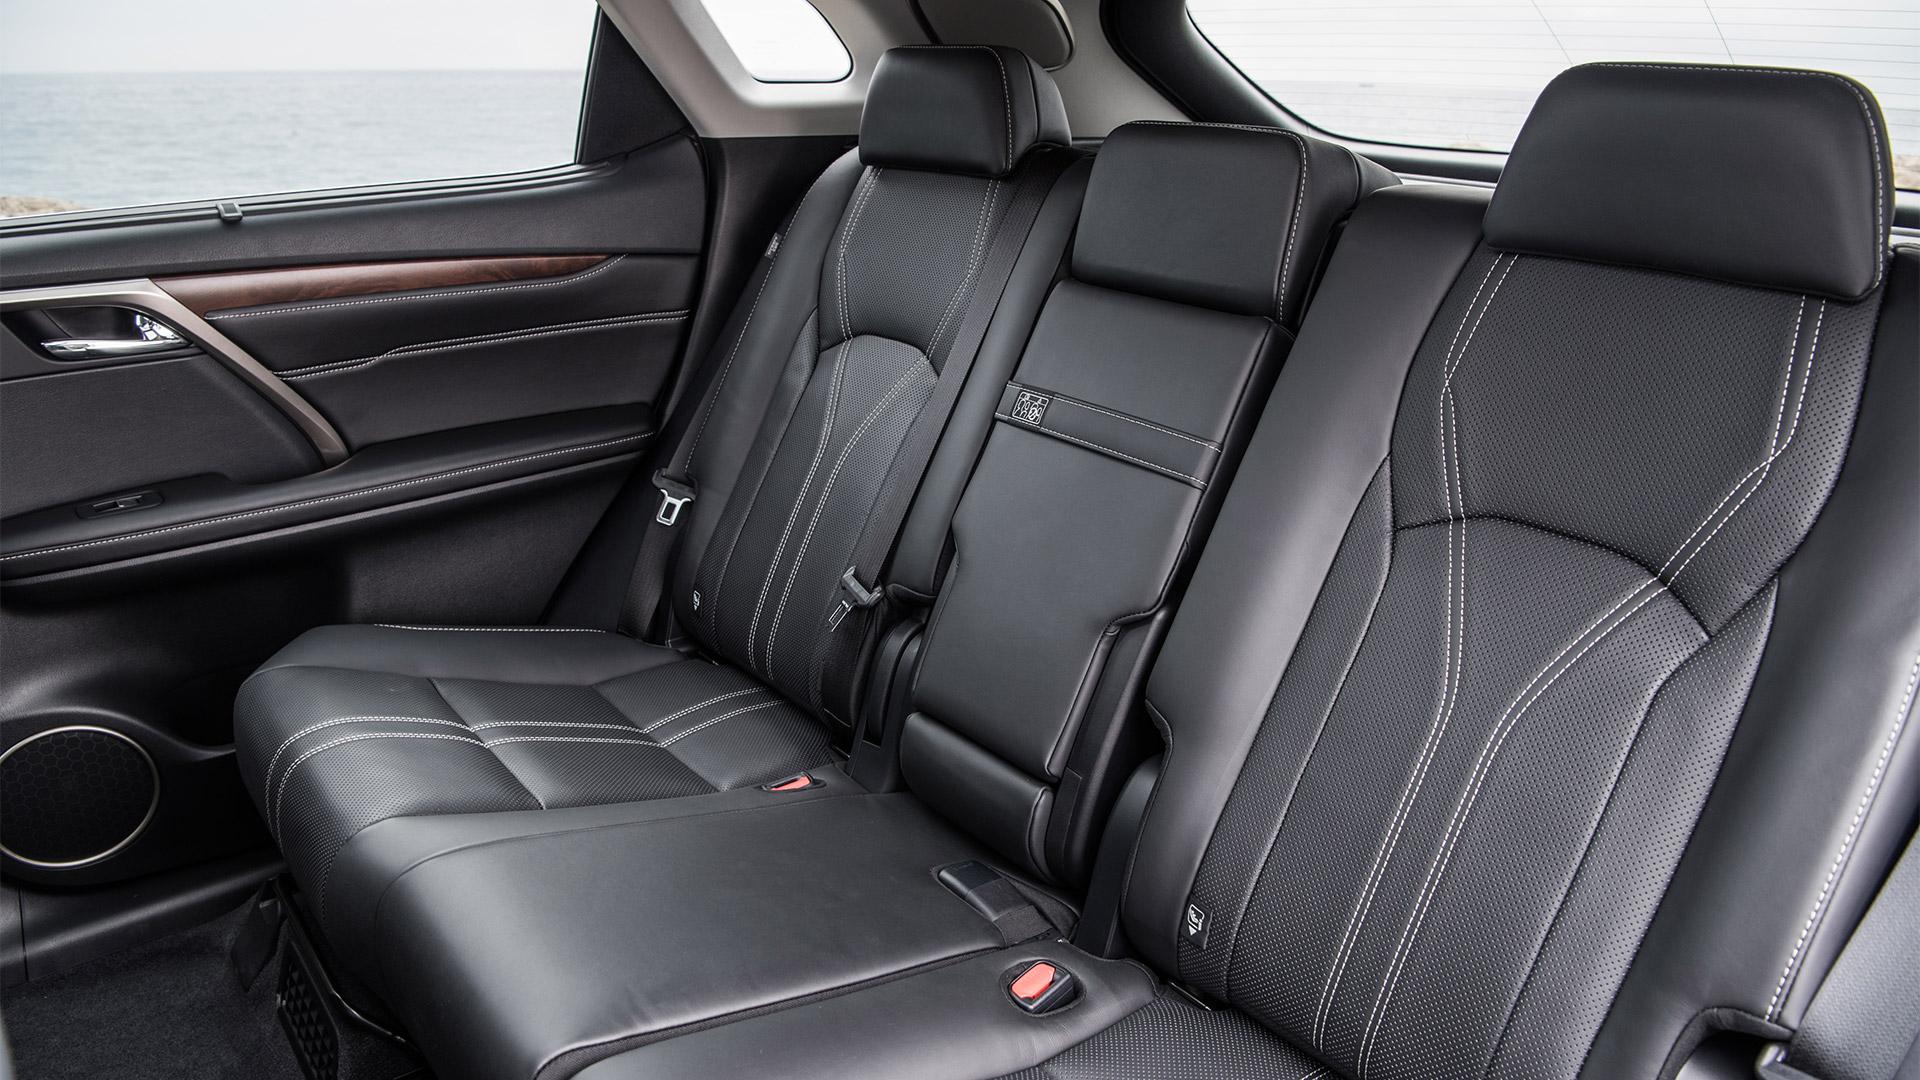 10 2019 020 Lexus RX pionier 1920x1080 galerij